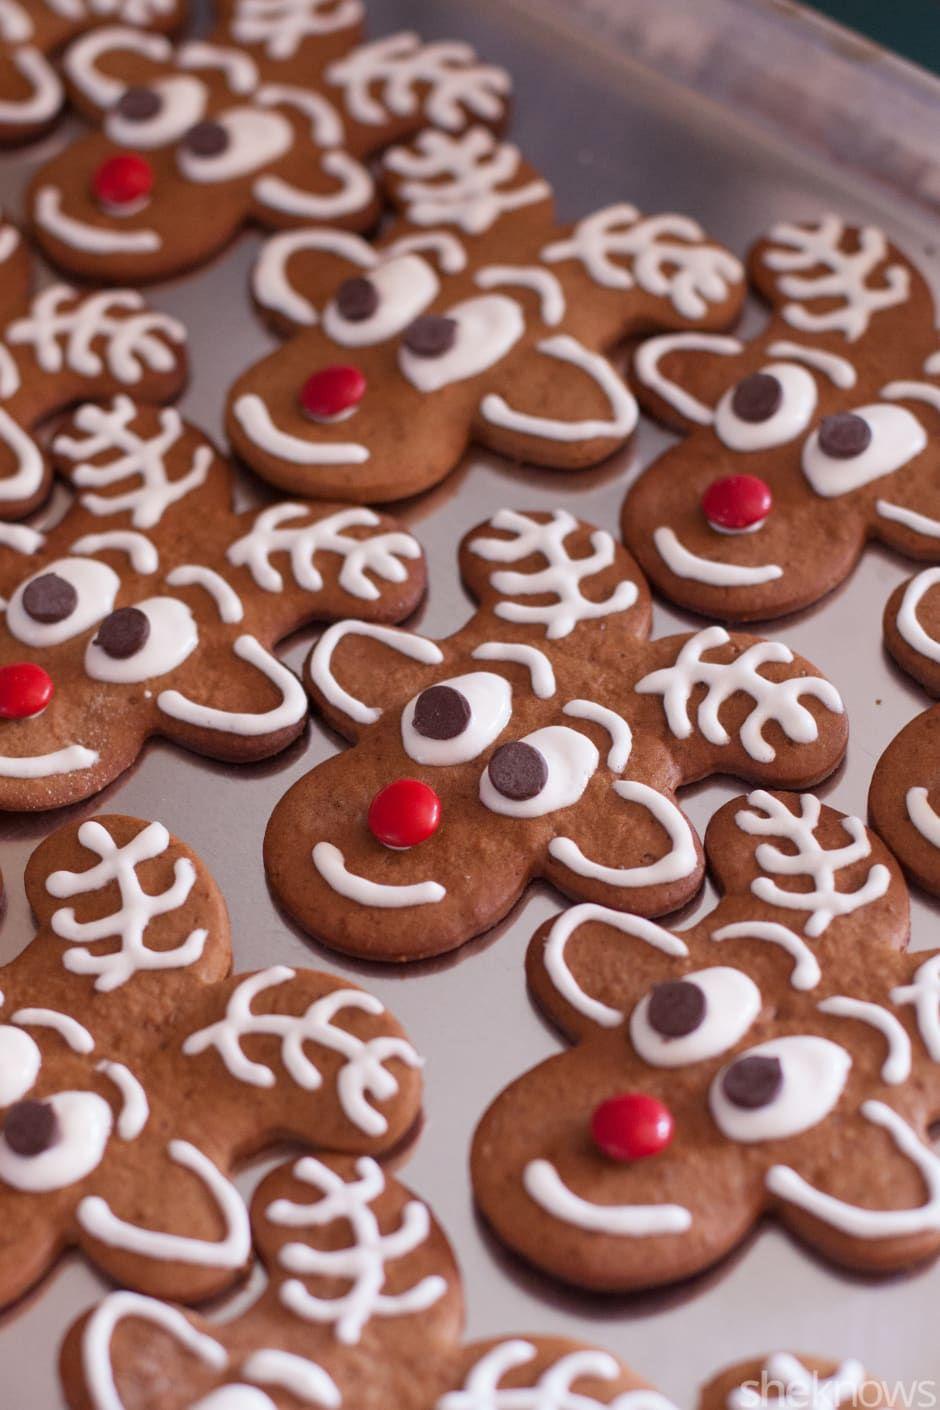 Upside Down Gingerbread Men Become Santa S Reindeer In These